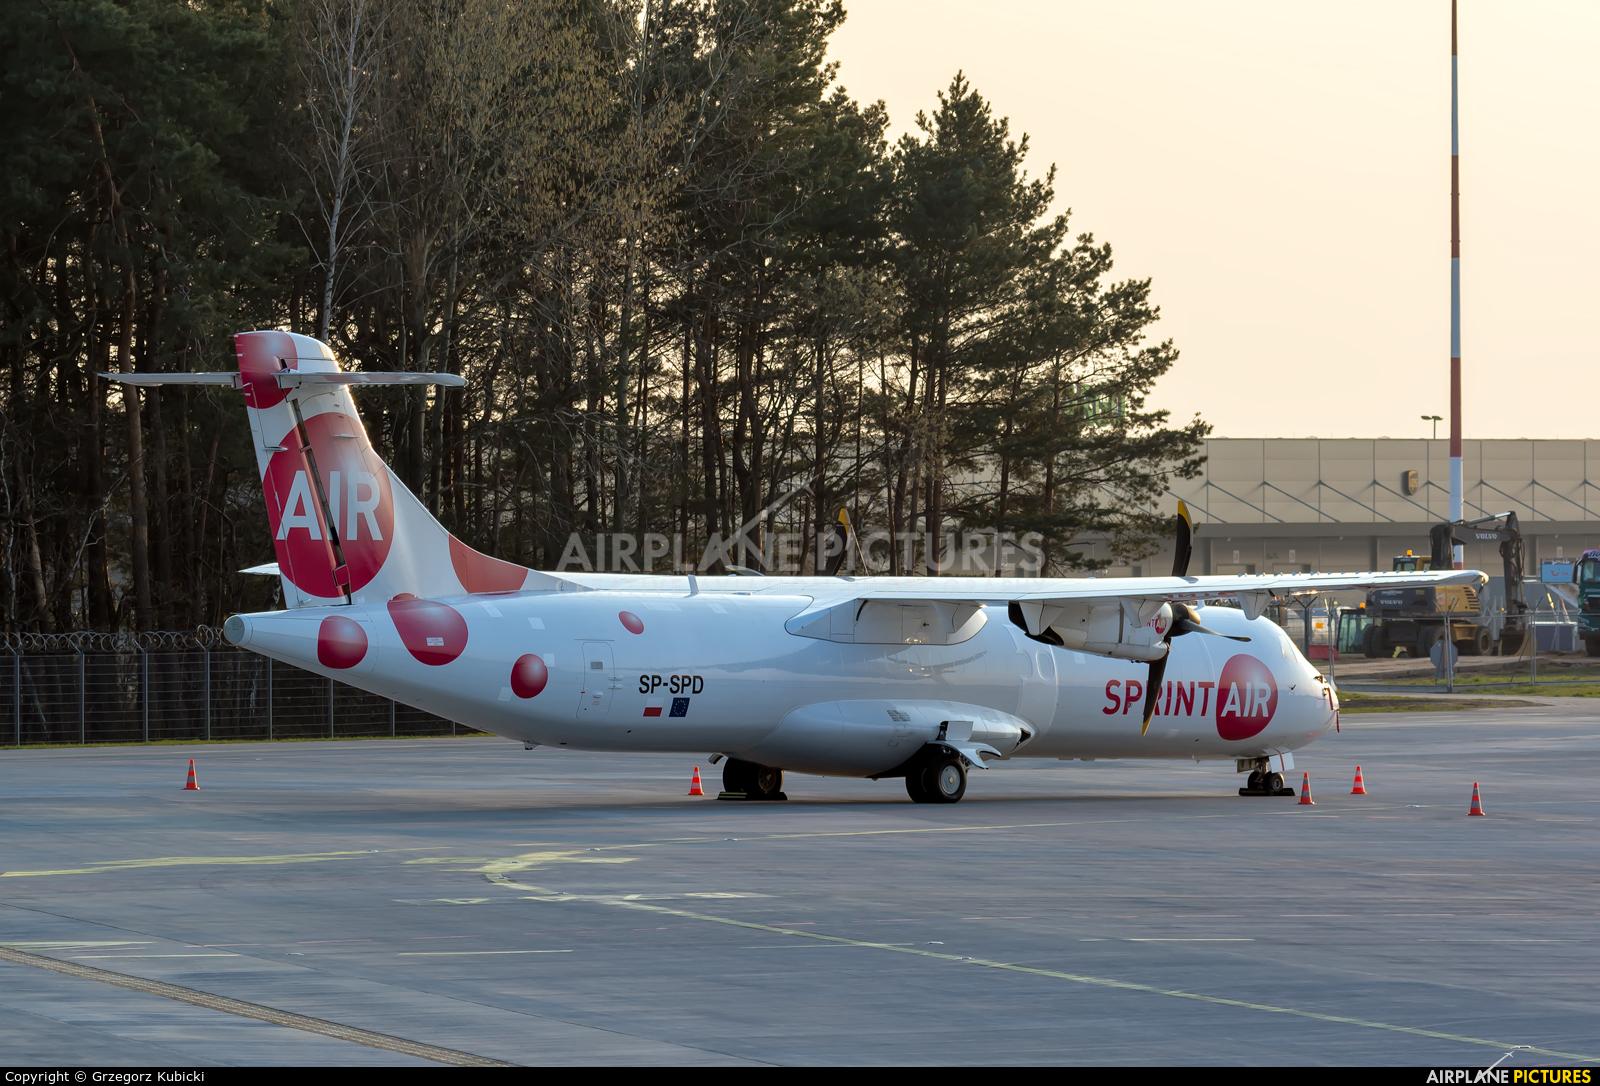 Sprint Air SP-SPD aircraft at Katowice - Pyrzowice